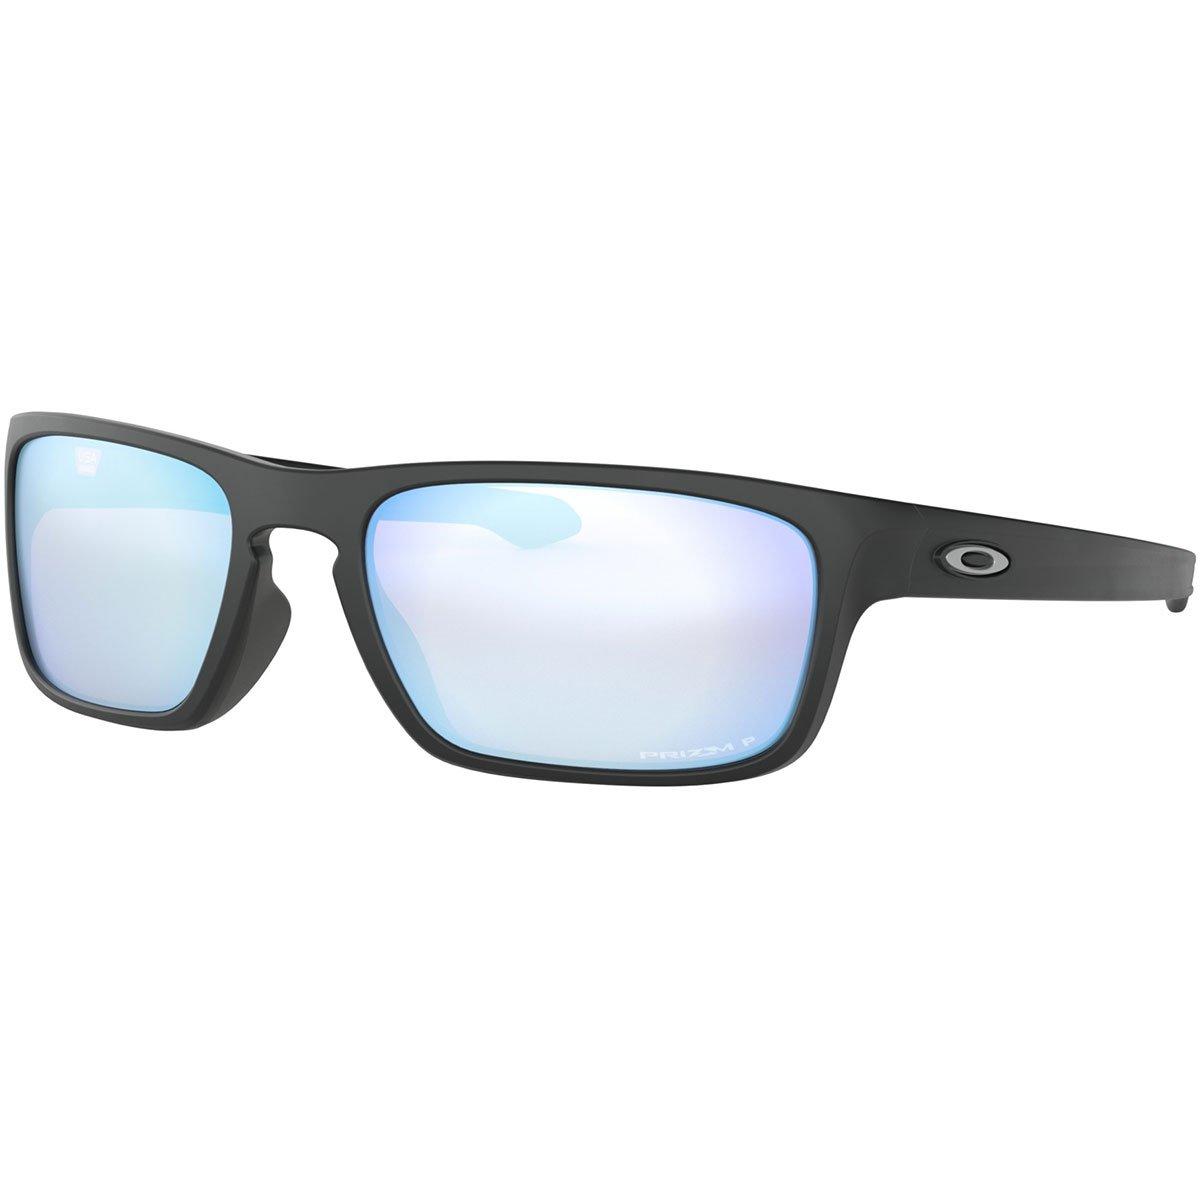 Oakley Men's OO9408 Sliver Stealth Square Sunglasses, Matte Black/Prizm Deep H2O Polarized, 56 mm by Oakley